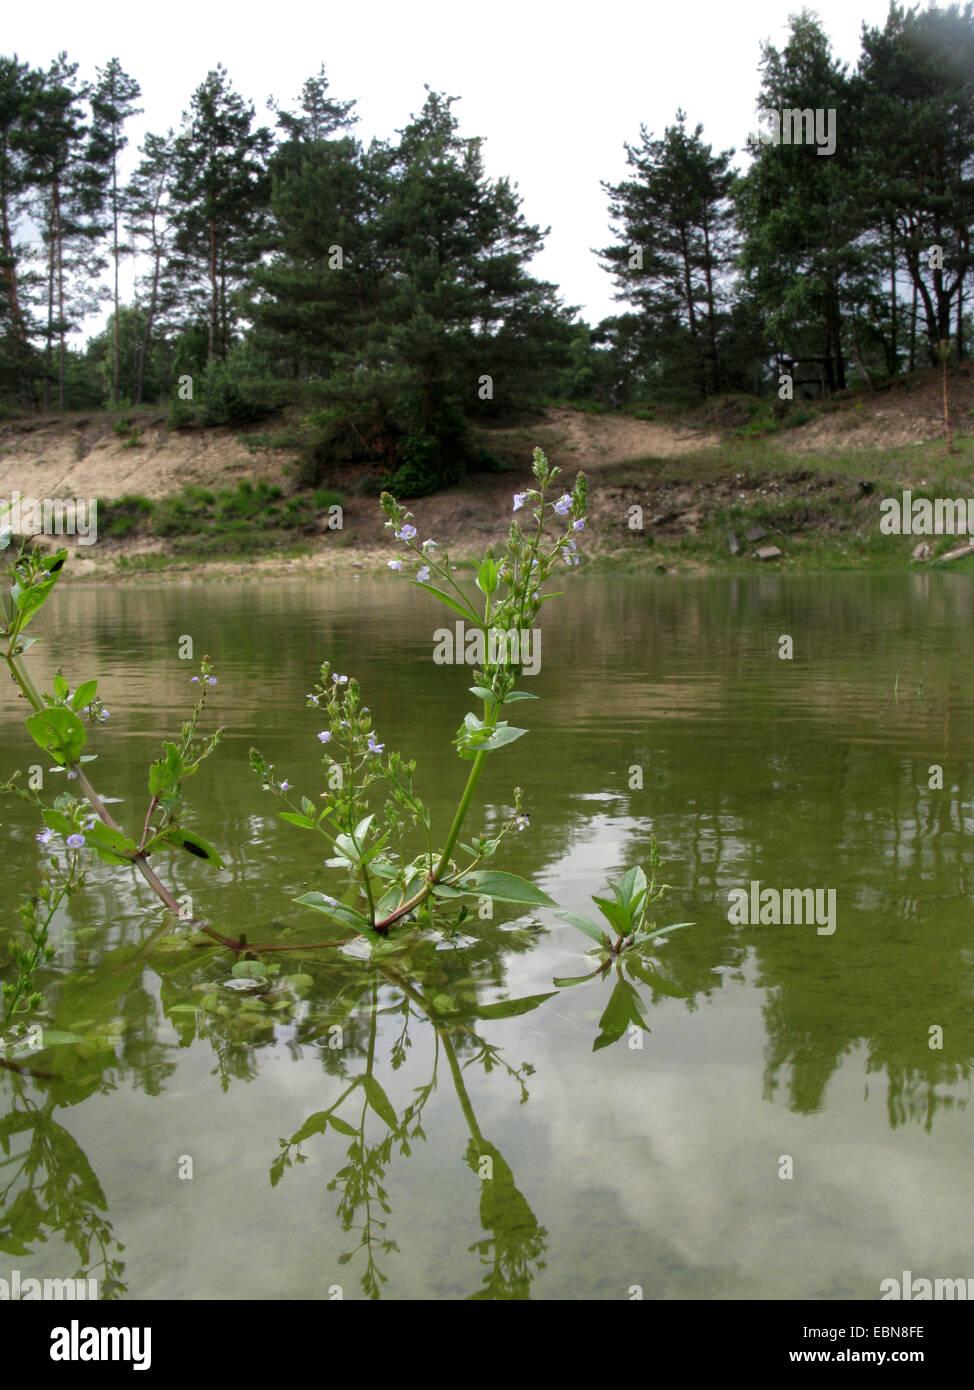 Agua speedwell, blue water-speedwell, Brook-pimpernell (Veronica anagallis-aquatica), florece en un estanque, en Imagen De Stock